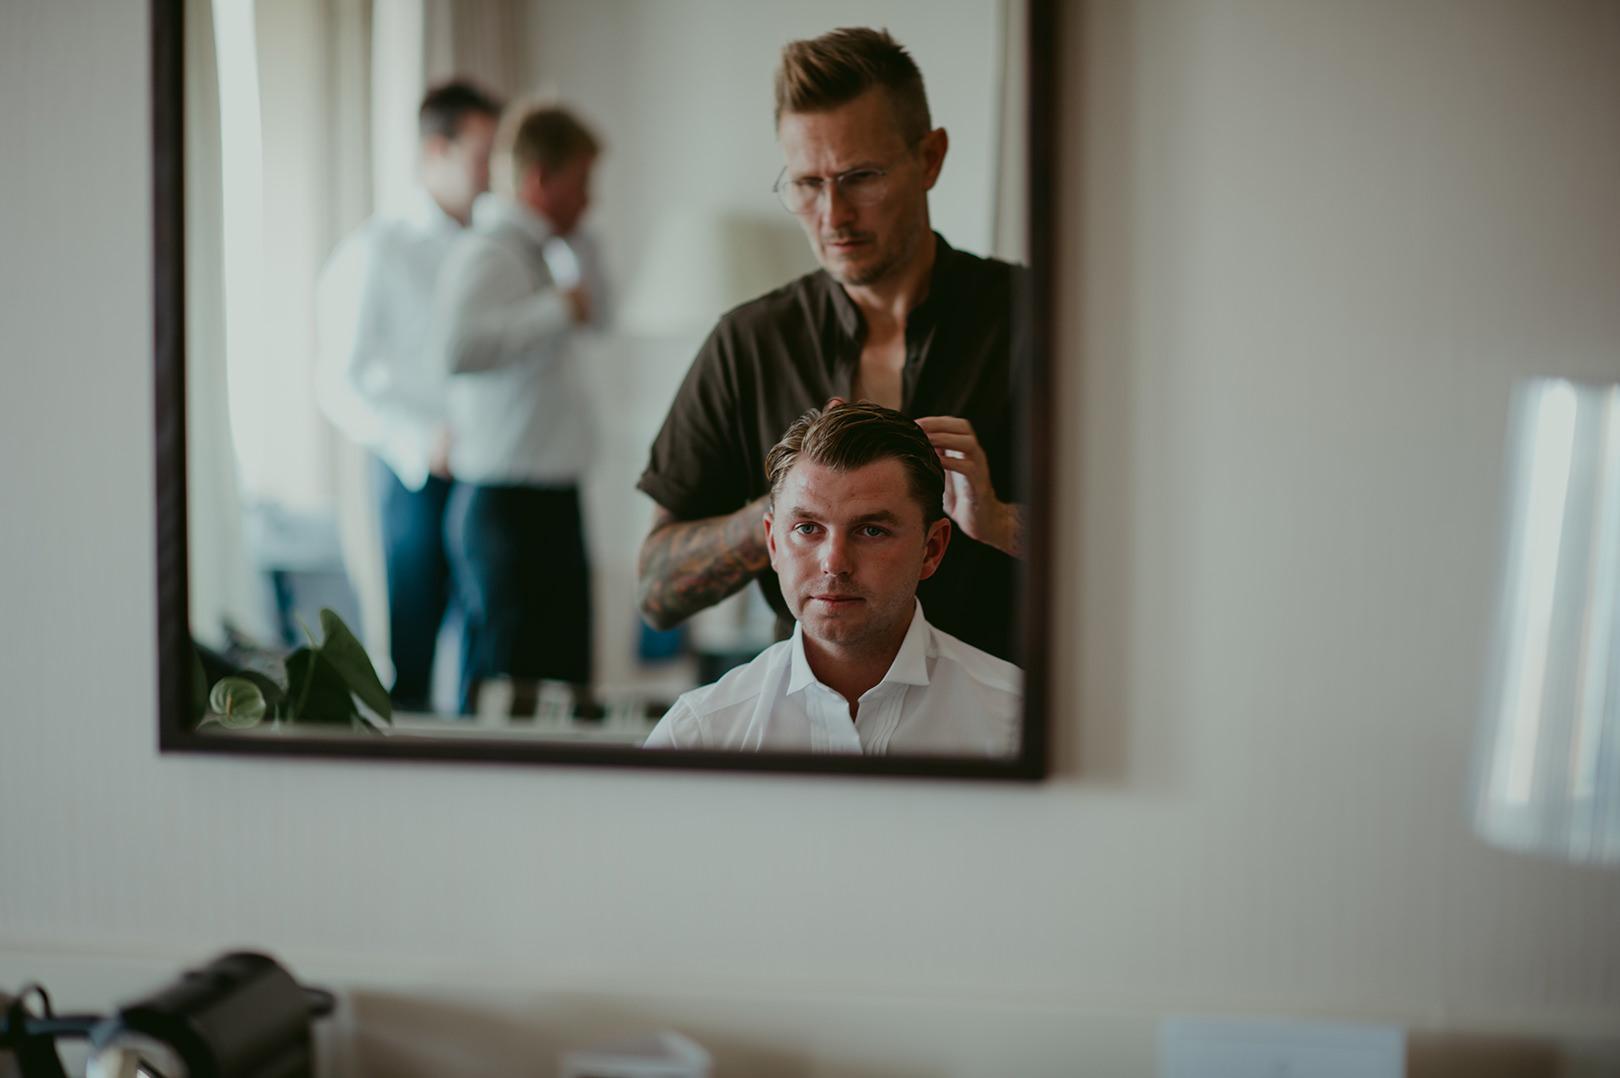 Groom wedding preparation Cannes